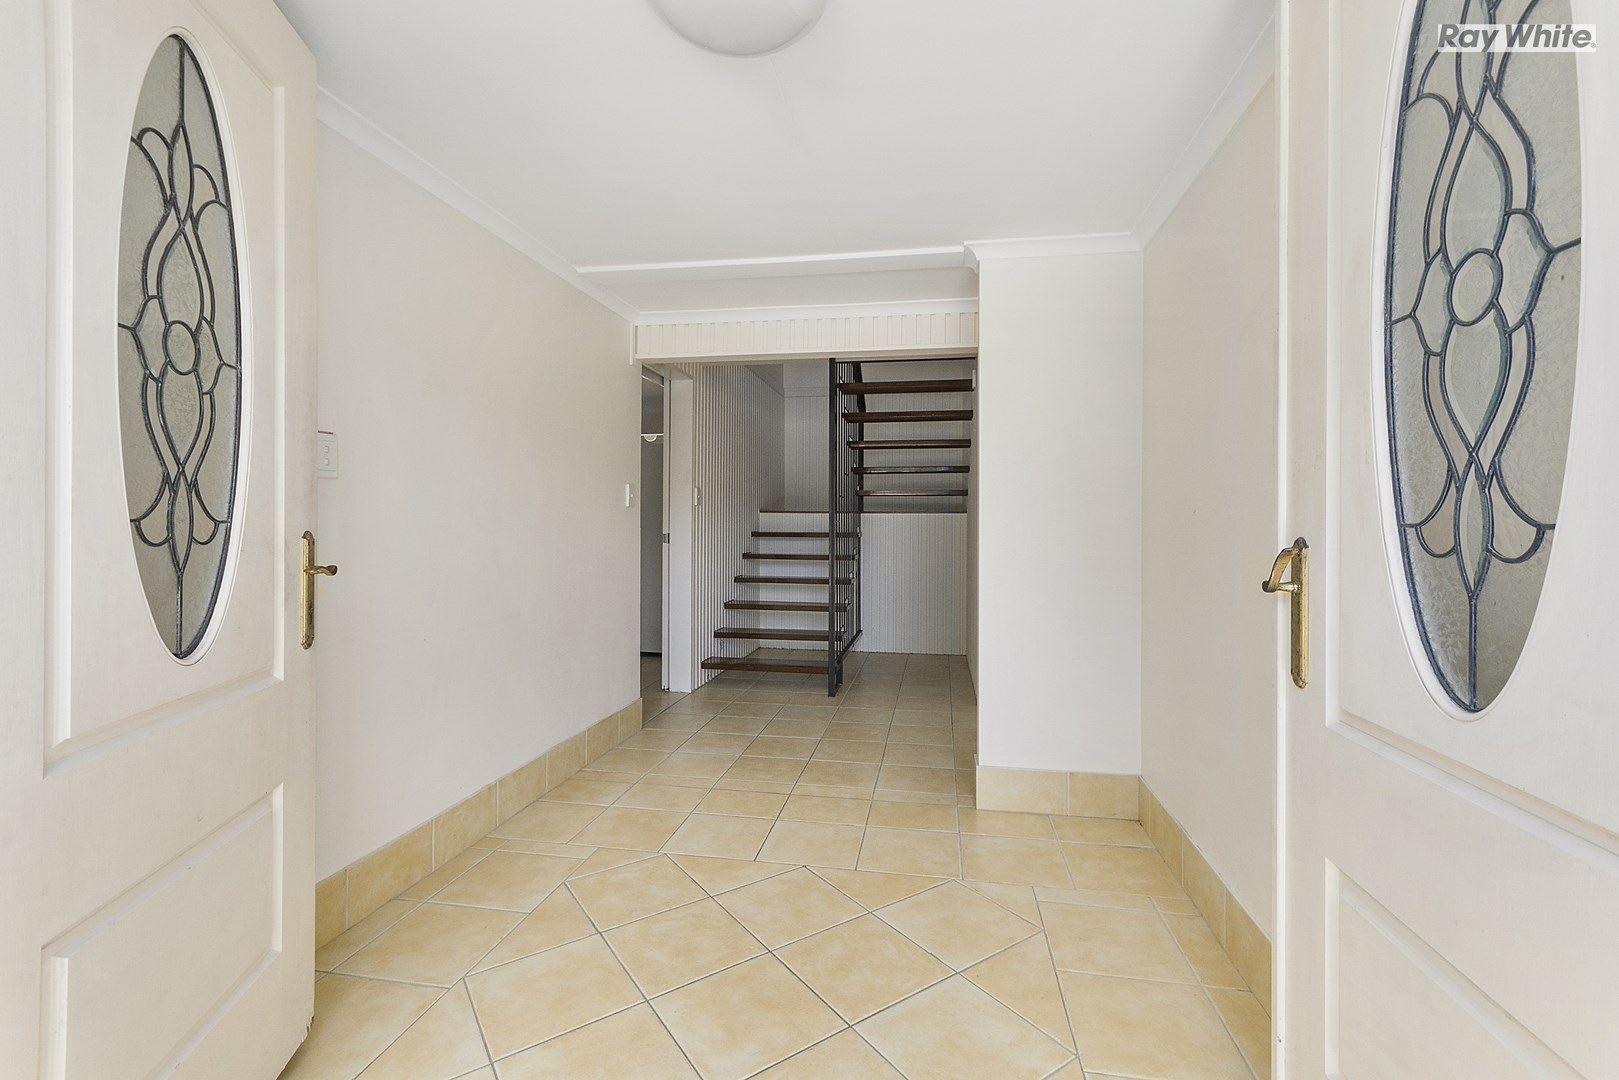 111 Curragundi Rd, Jindalee QLD 4074, Image 1